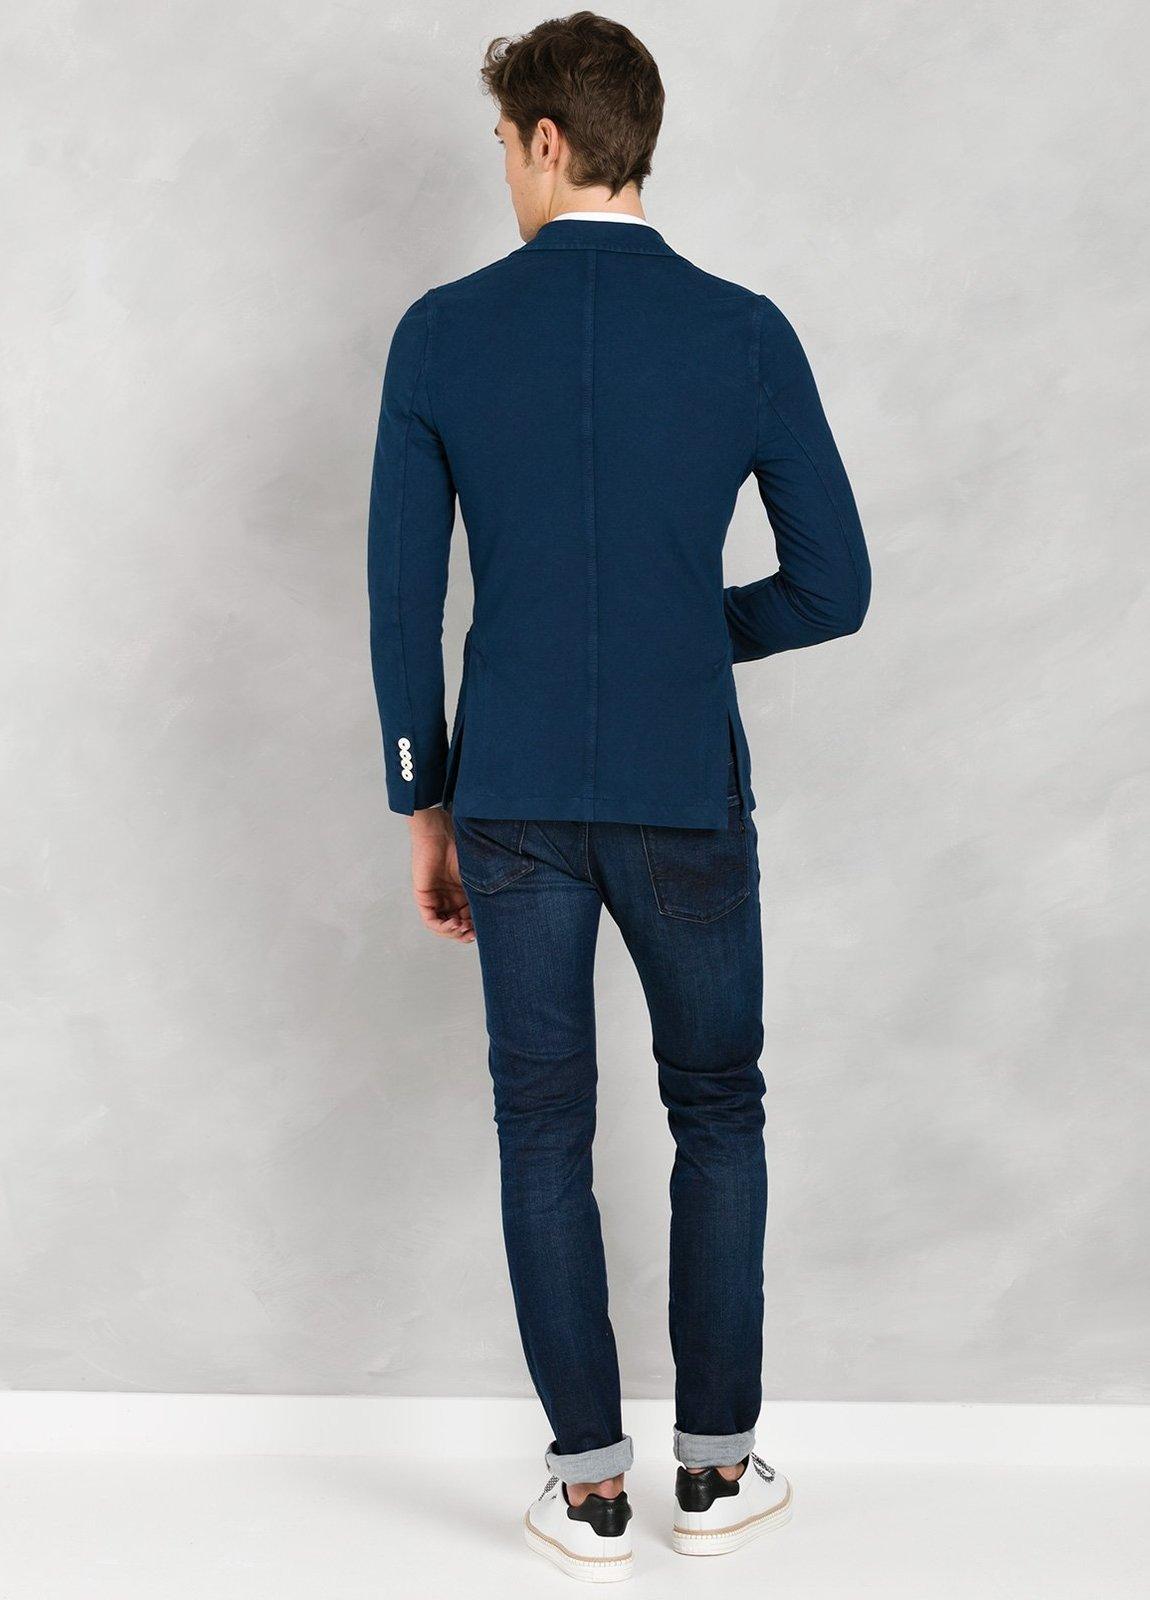 Americana soft 2 botones SLIM FIT color azul oscuro efecto denim, 95% Algodón 5% Elastán. - Ítem2